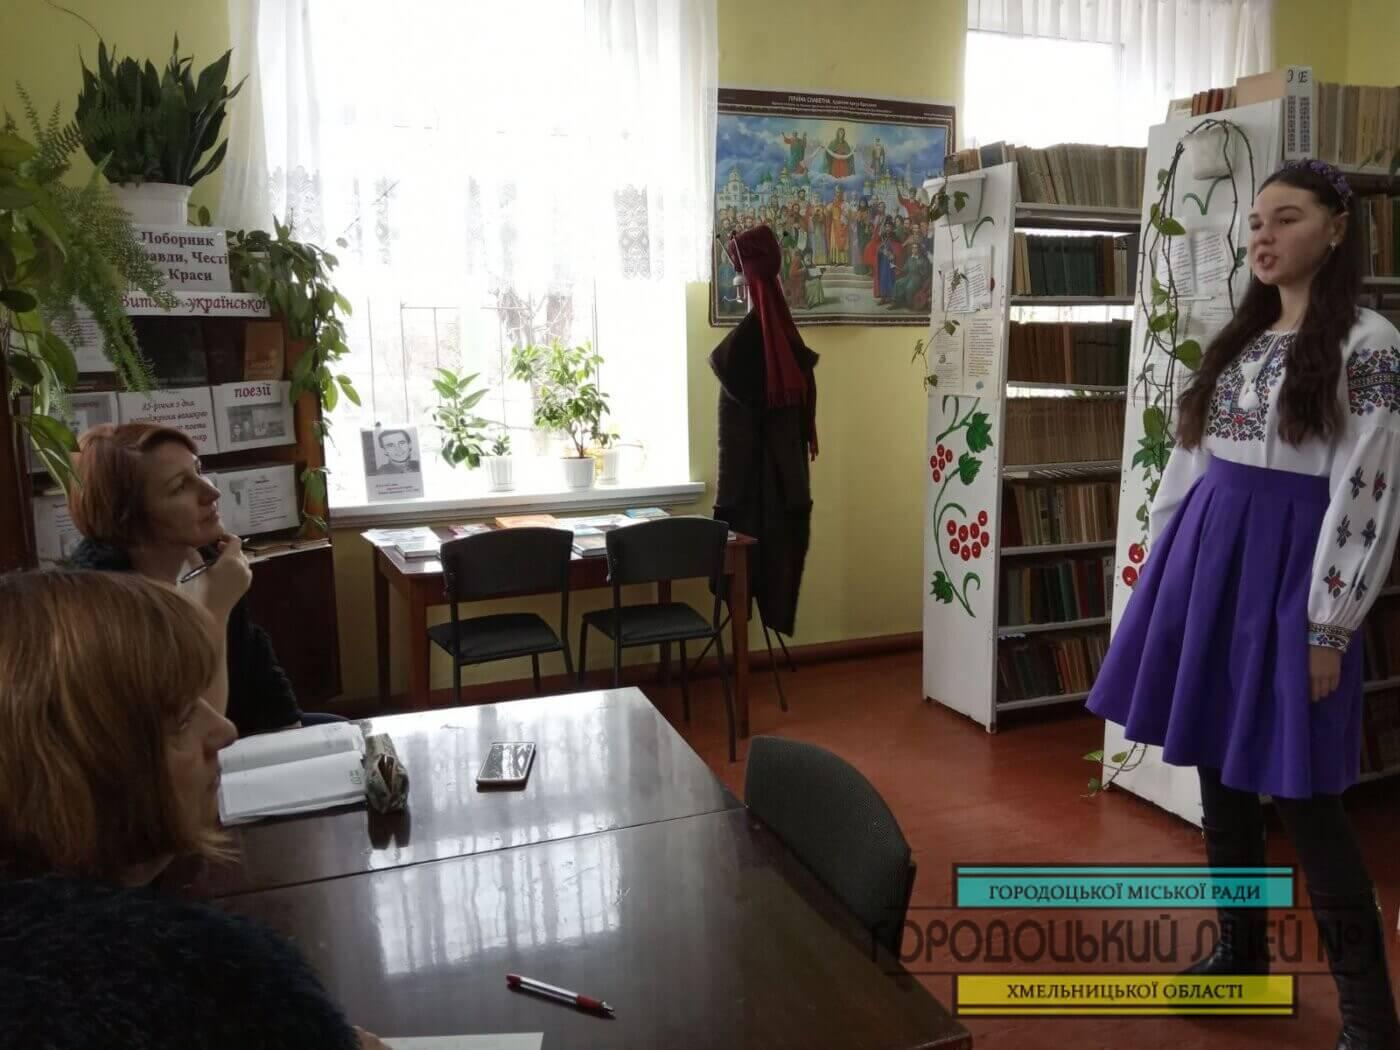 zobrazhennya viber 2021 01 25 13 57 146 1400x1050 - Велична і Соборна, моя ти Україно!